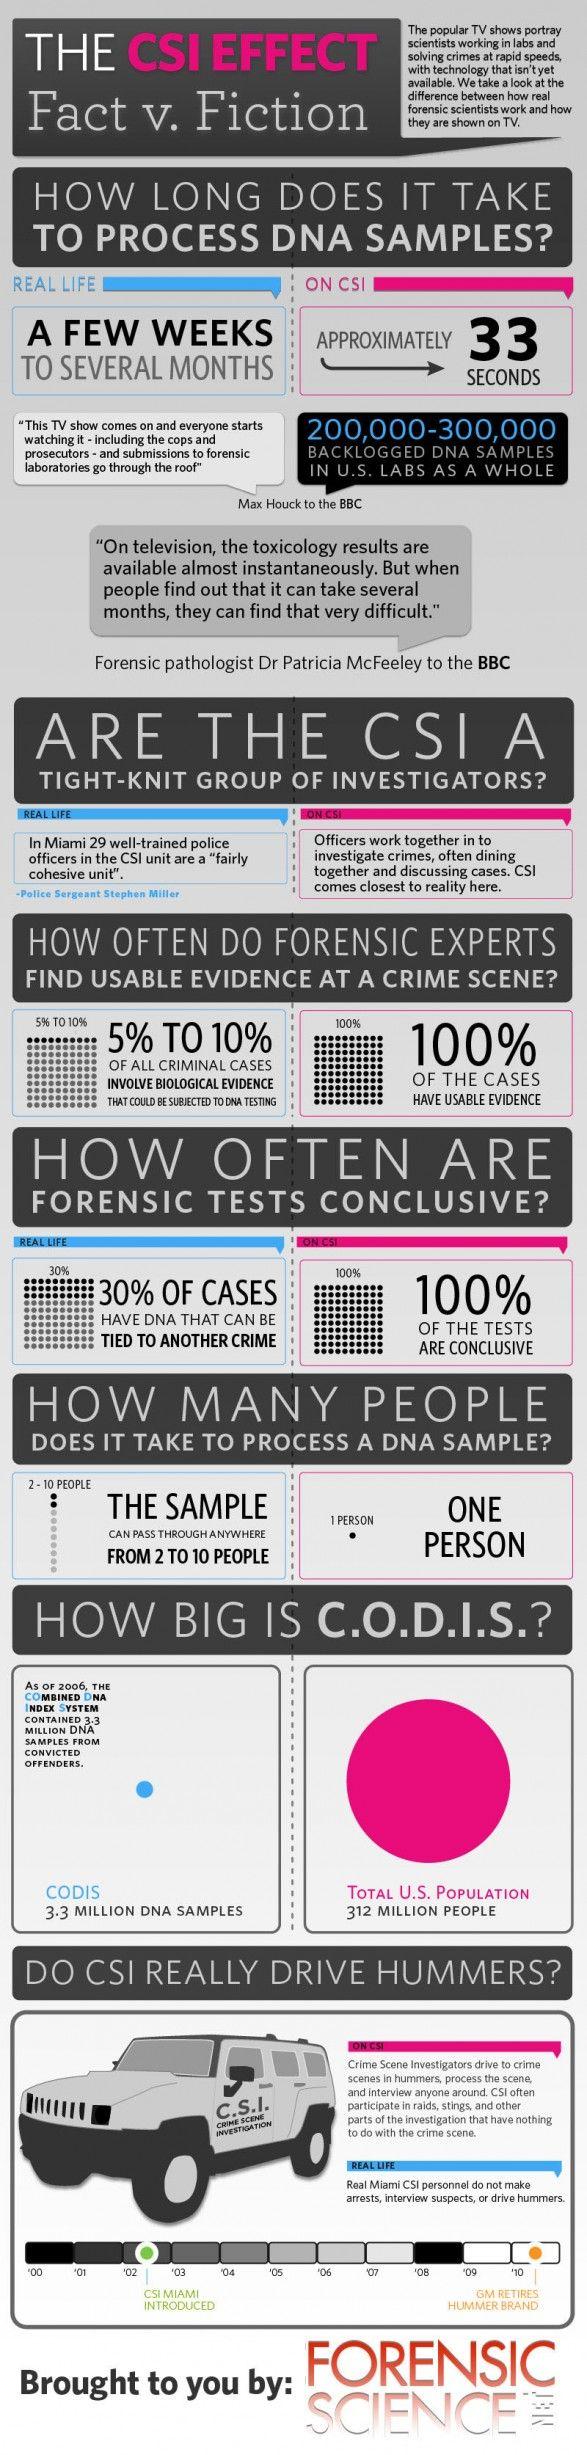 Forensics realism